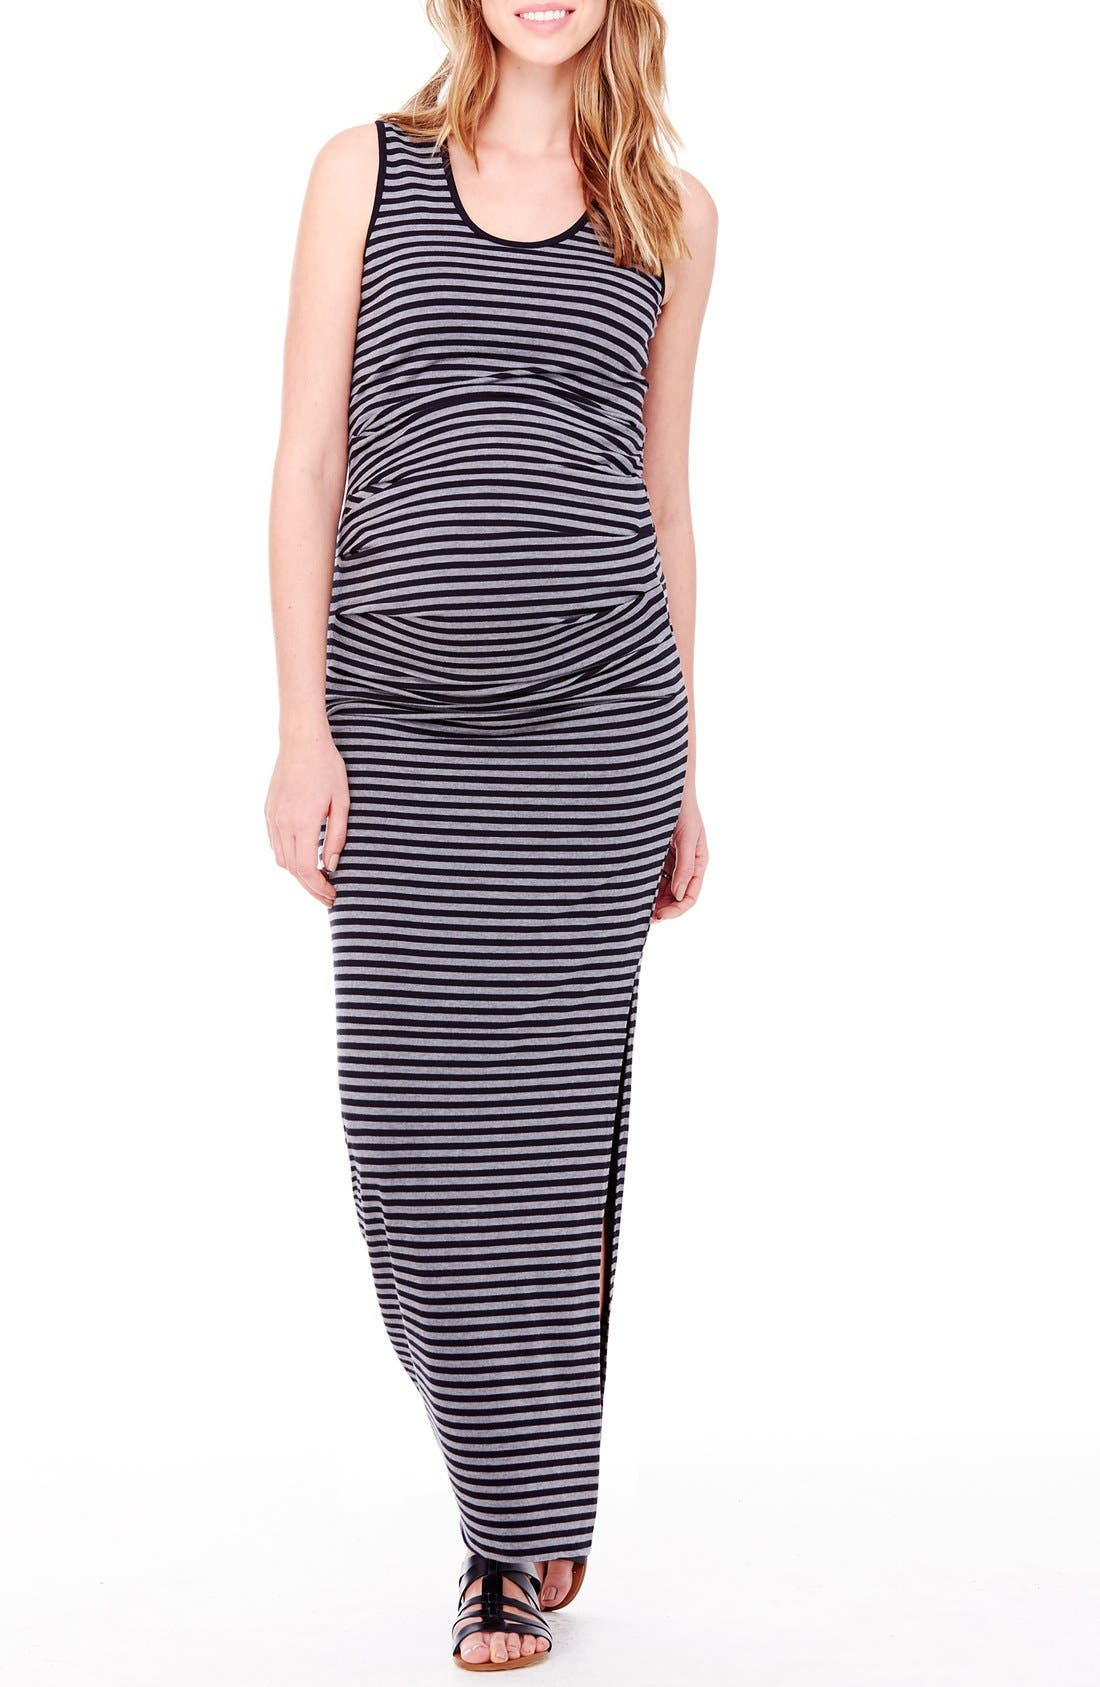 Striped Tank Maternity Maxi Dress,                         Main,                         color, Black/ Heather Grey Stripe